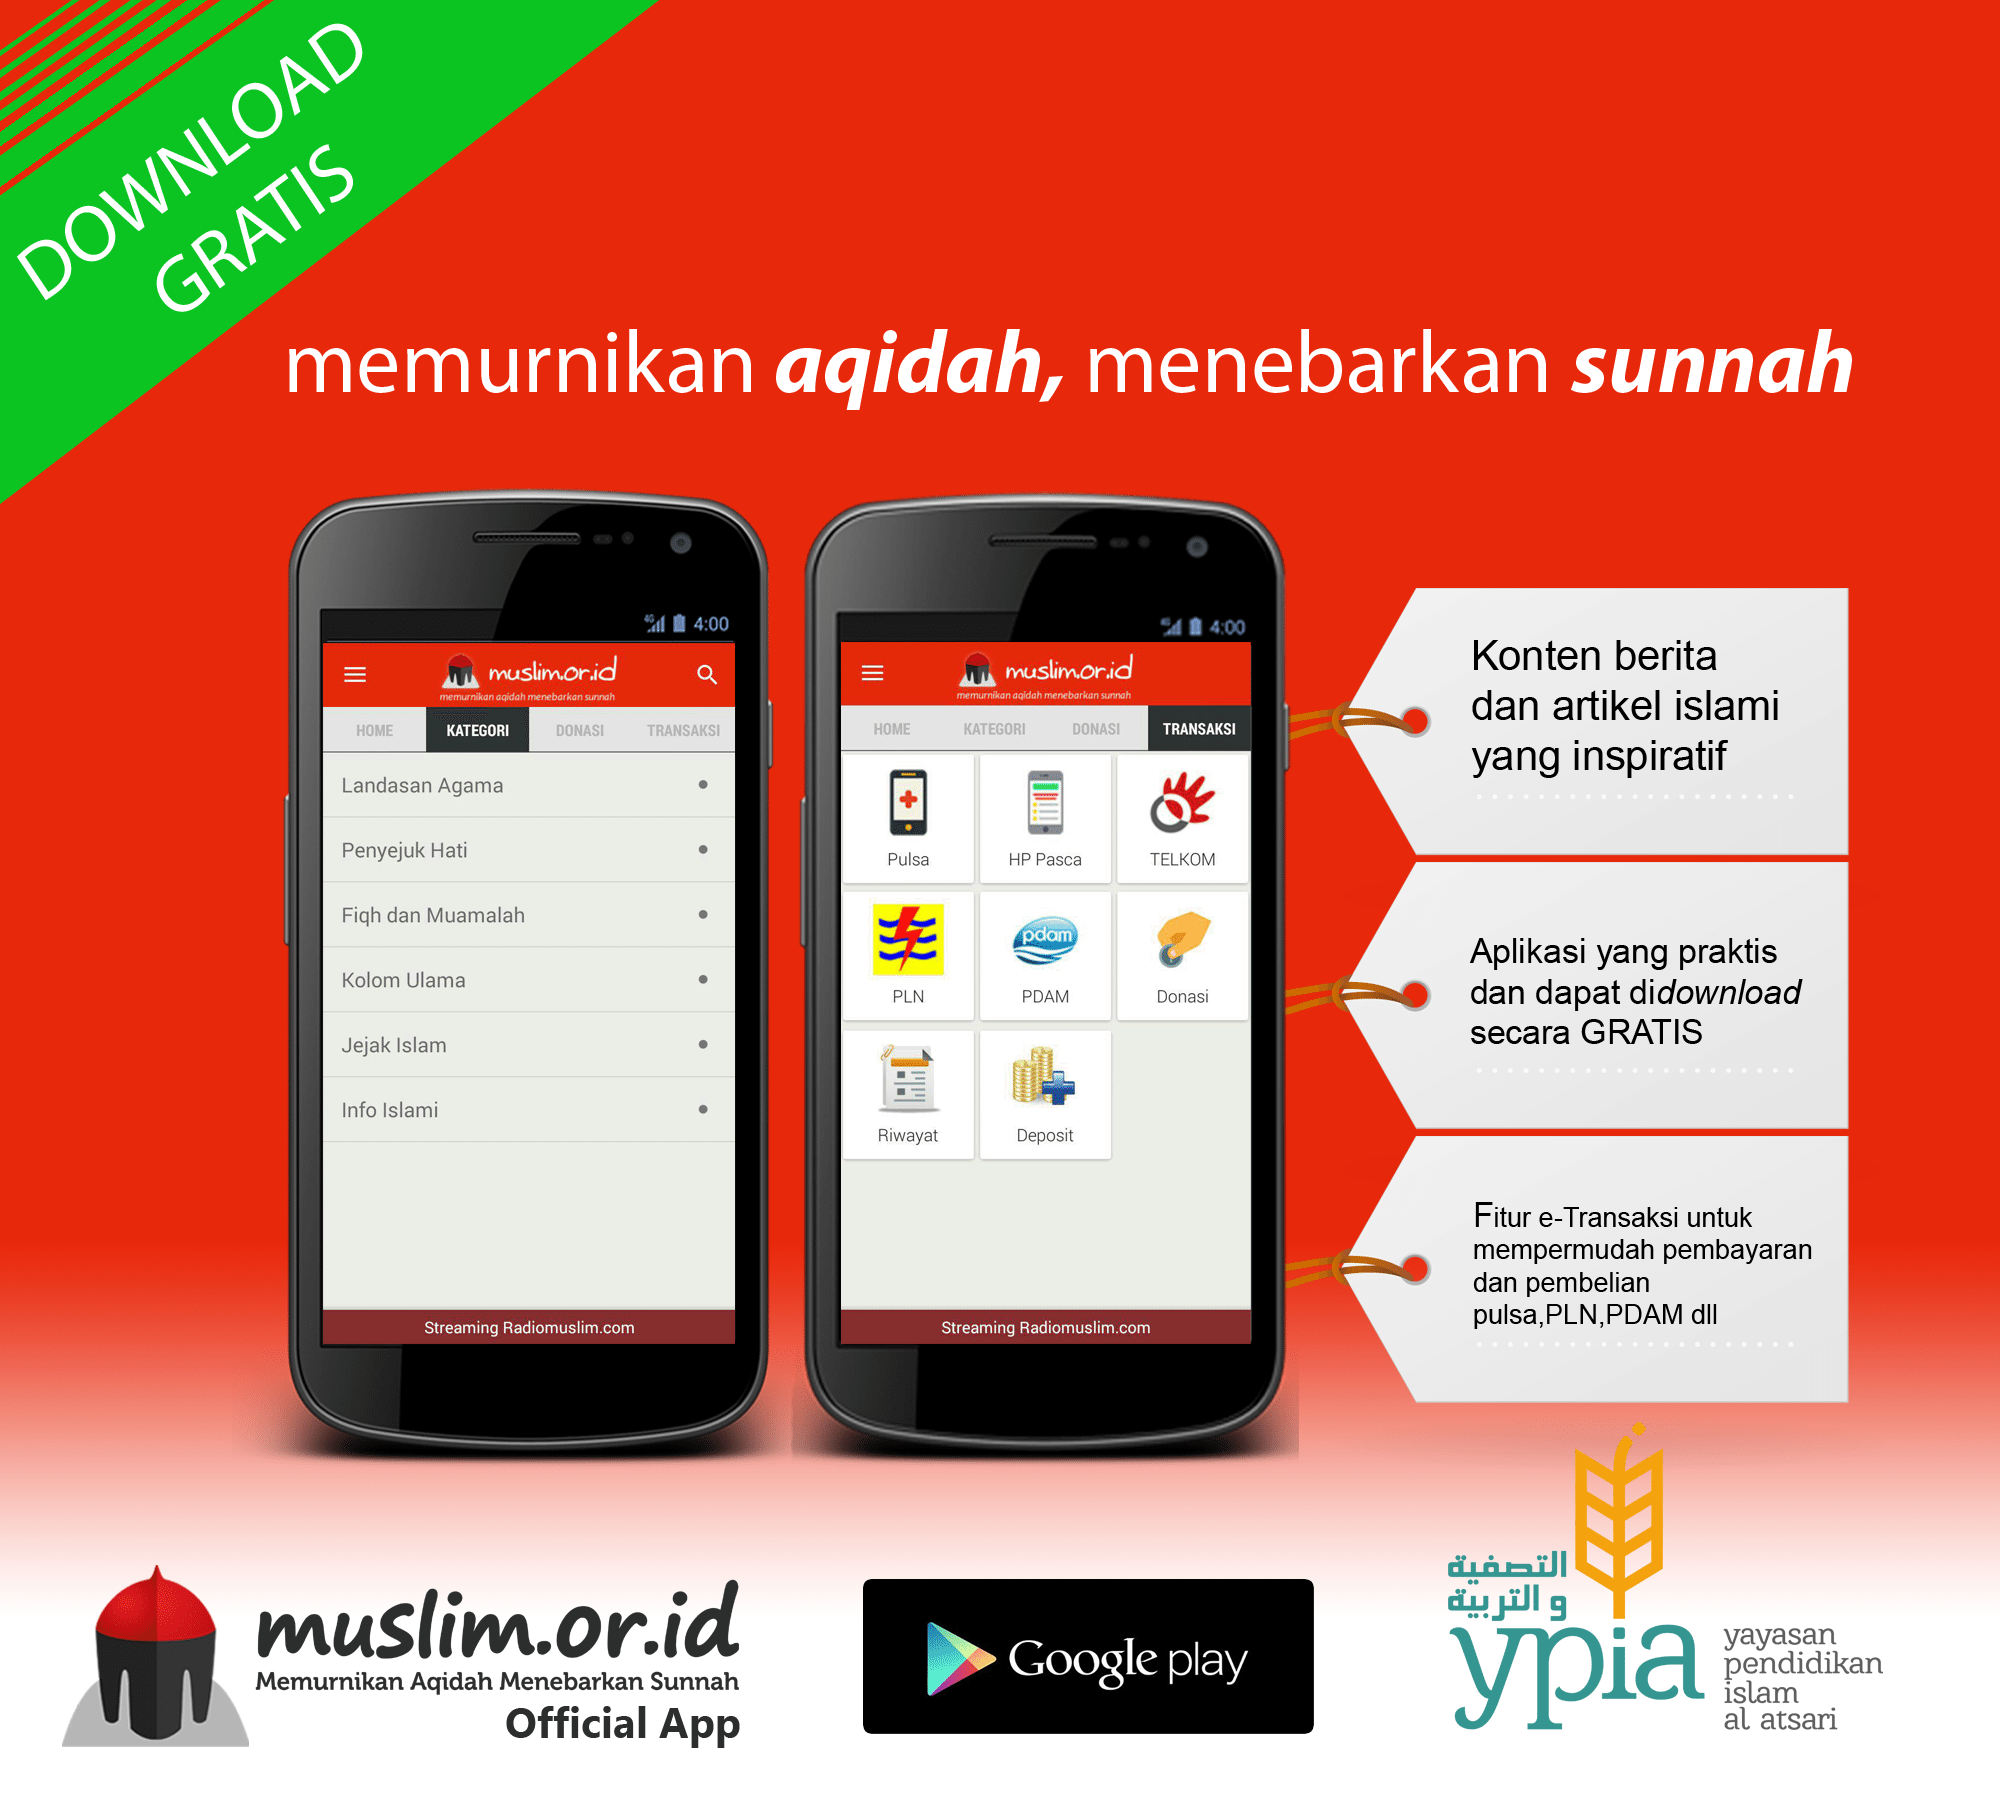 Aplikasi Android Gratis Muslim Or Id Aplikasi Android Doa Aplikasi